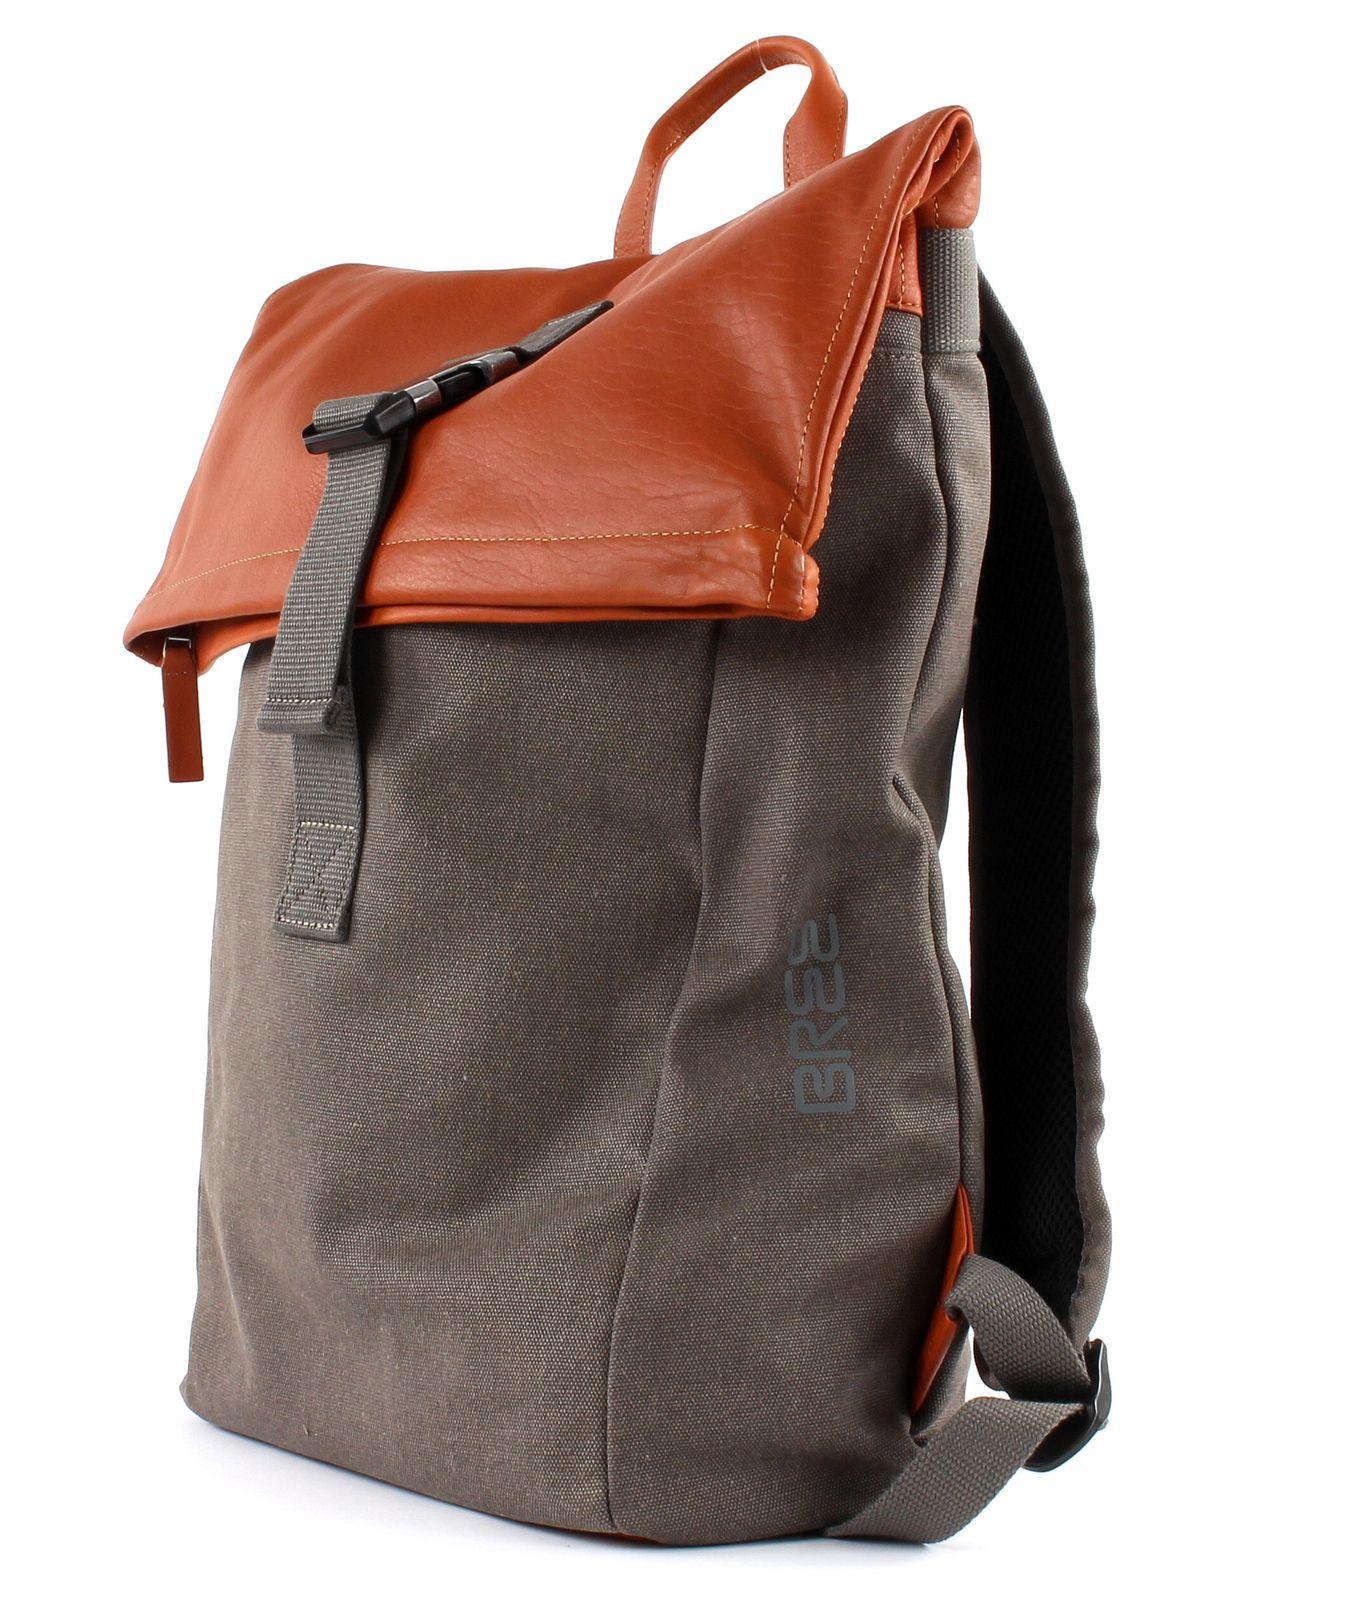 bree punch casual 93 backpack grey cognac. Black Bedroom Furniture Sets. Home Design Ideas